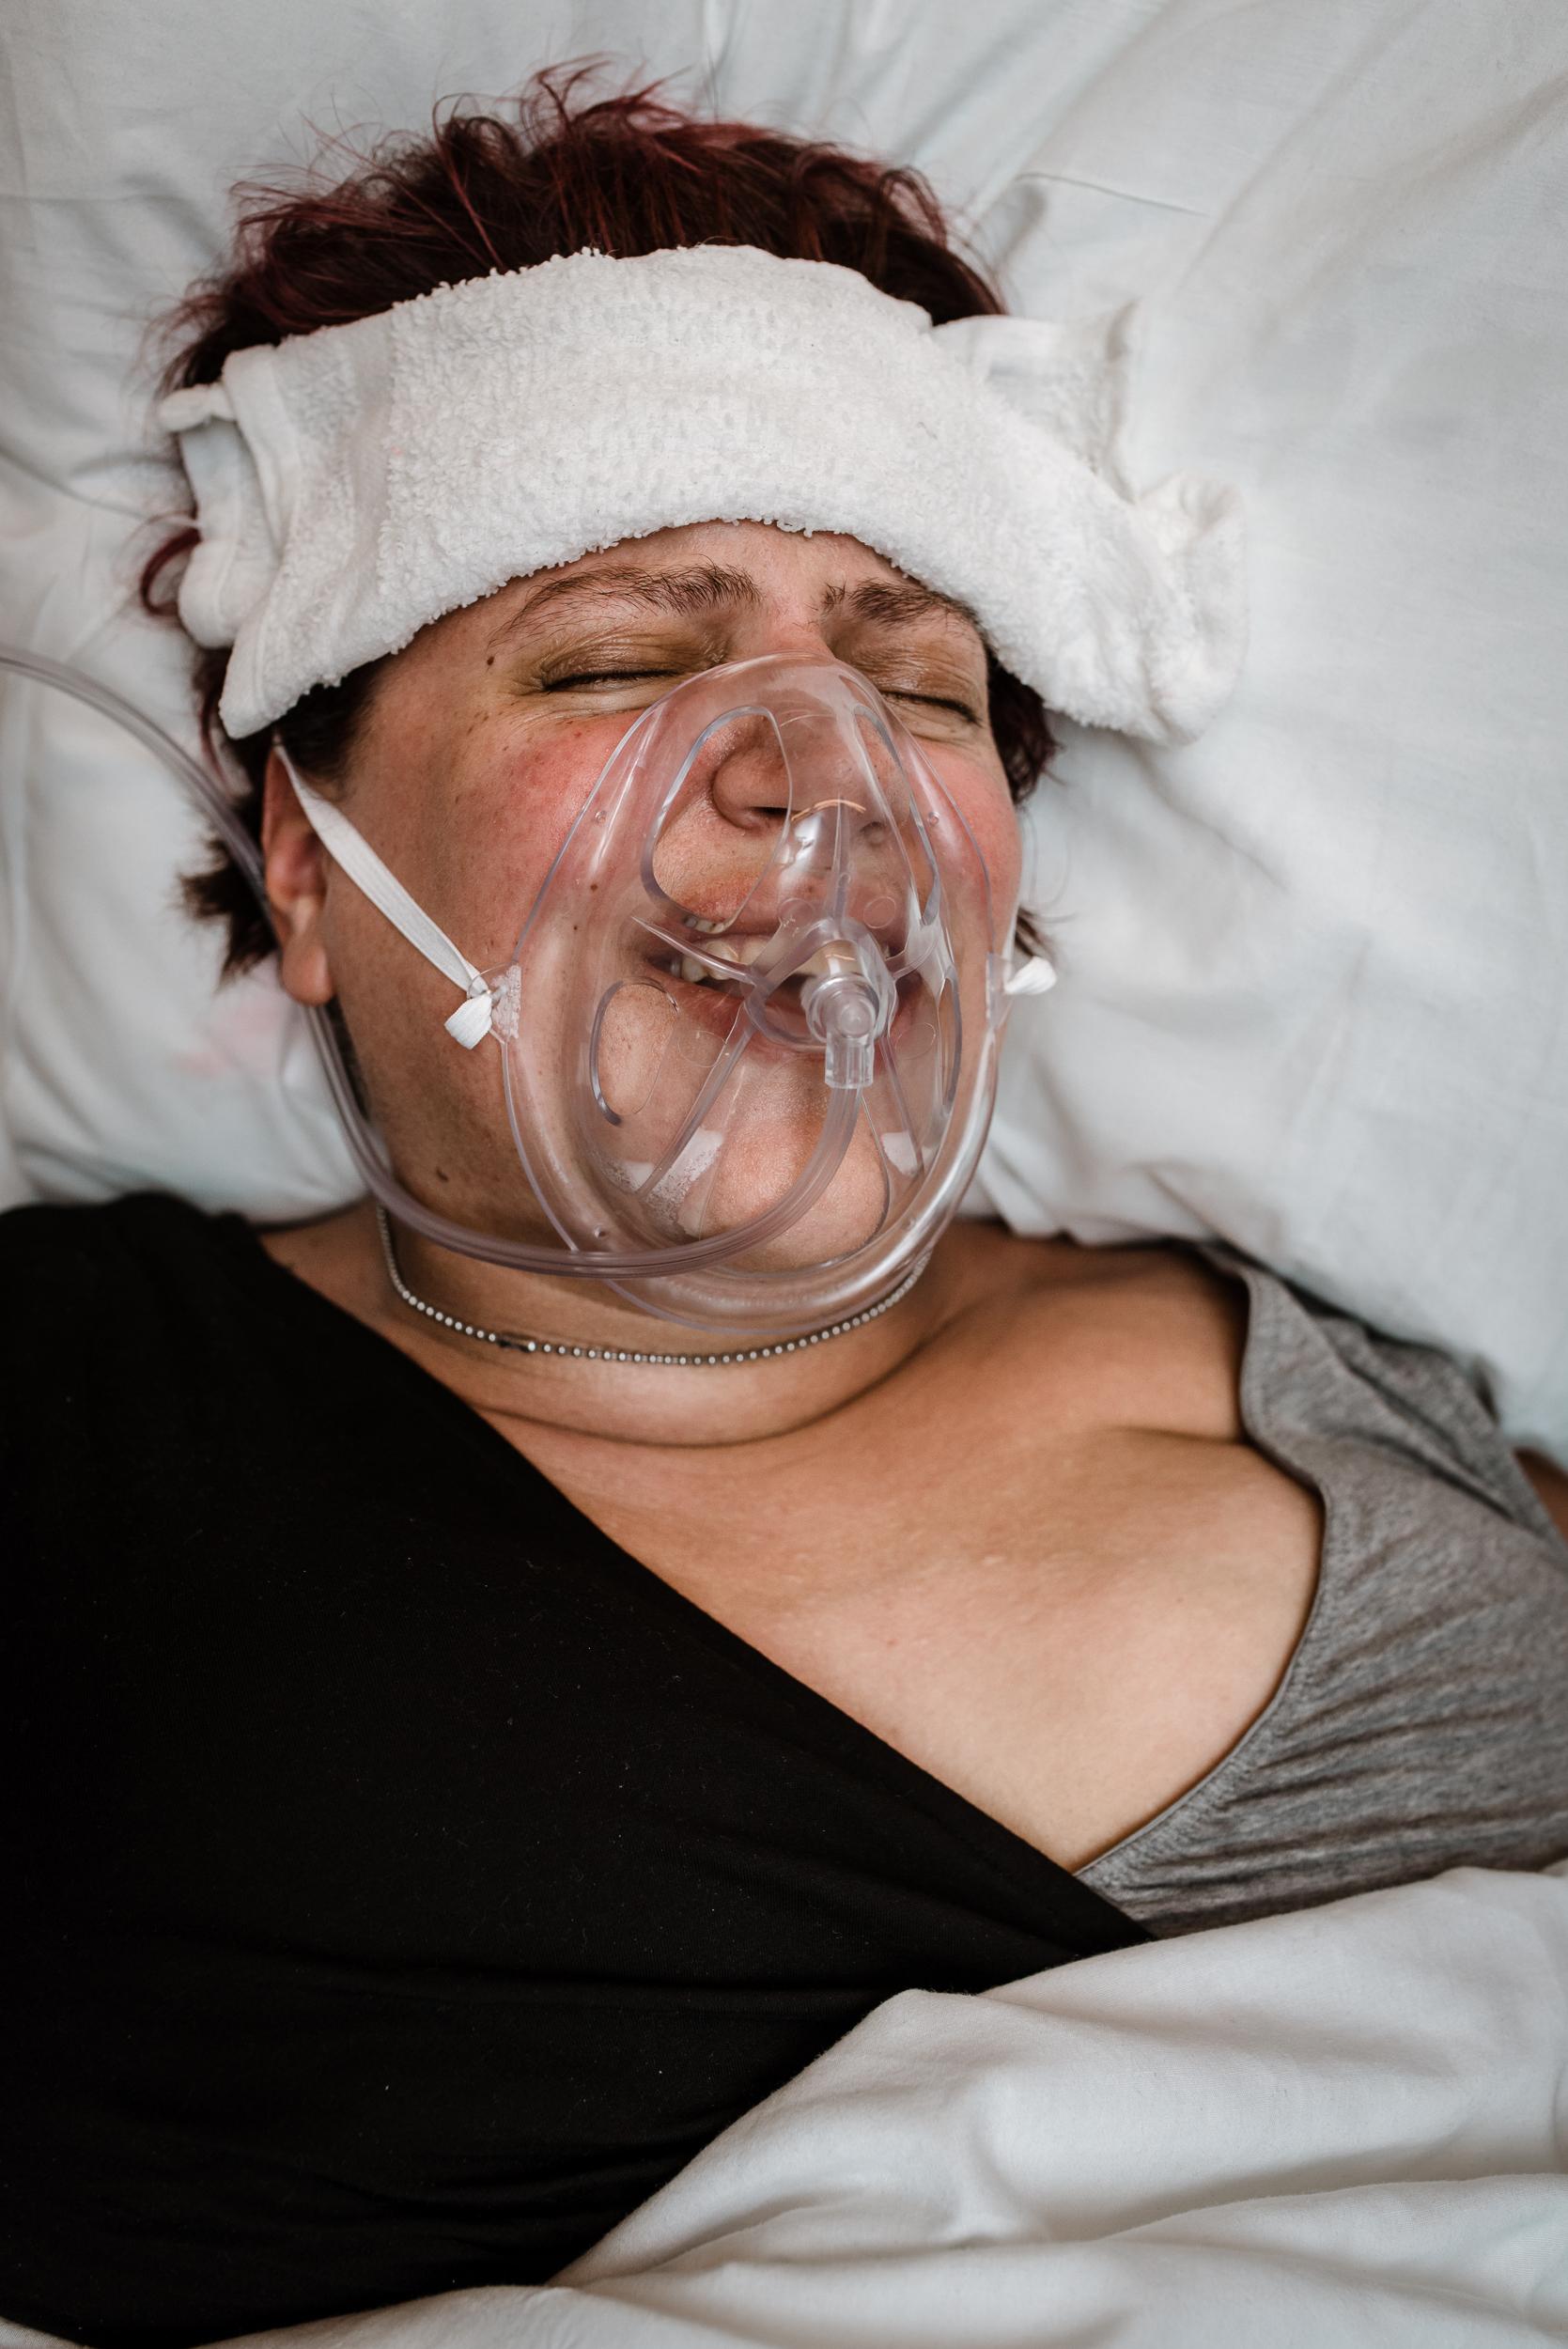 Best Birth Photography Minneapolis St. Paul Minnesota Meredith Westin-November 08, 2018-154313.jpg